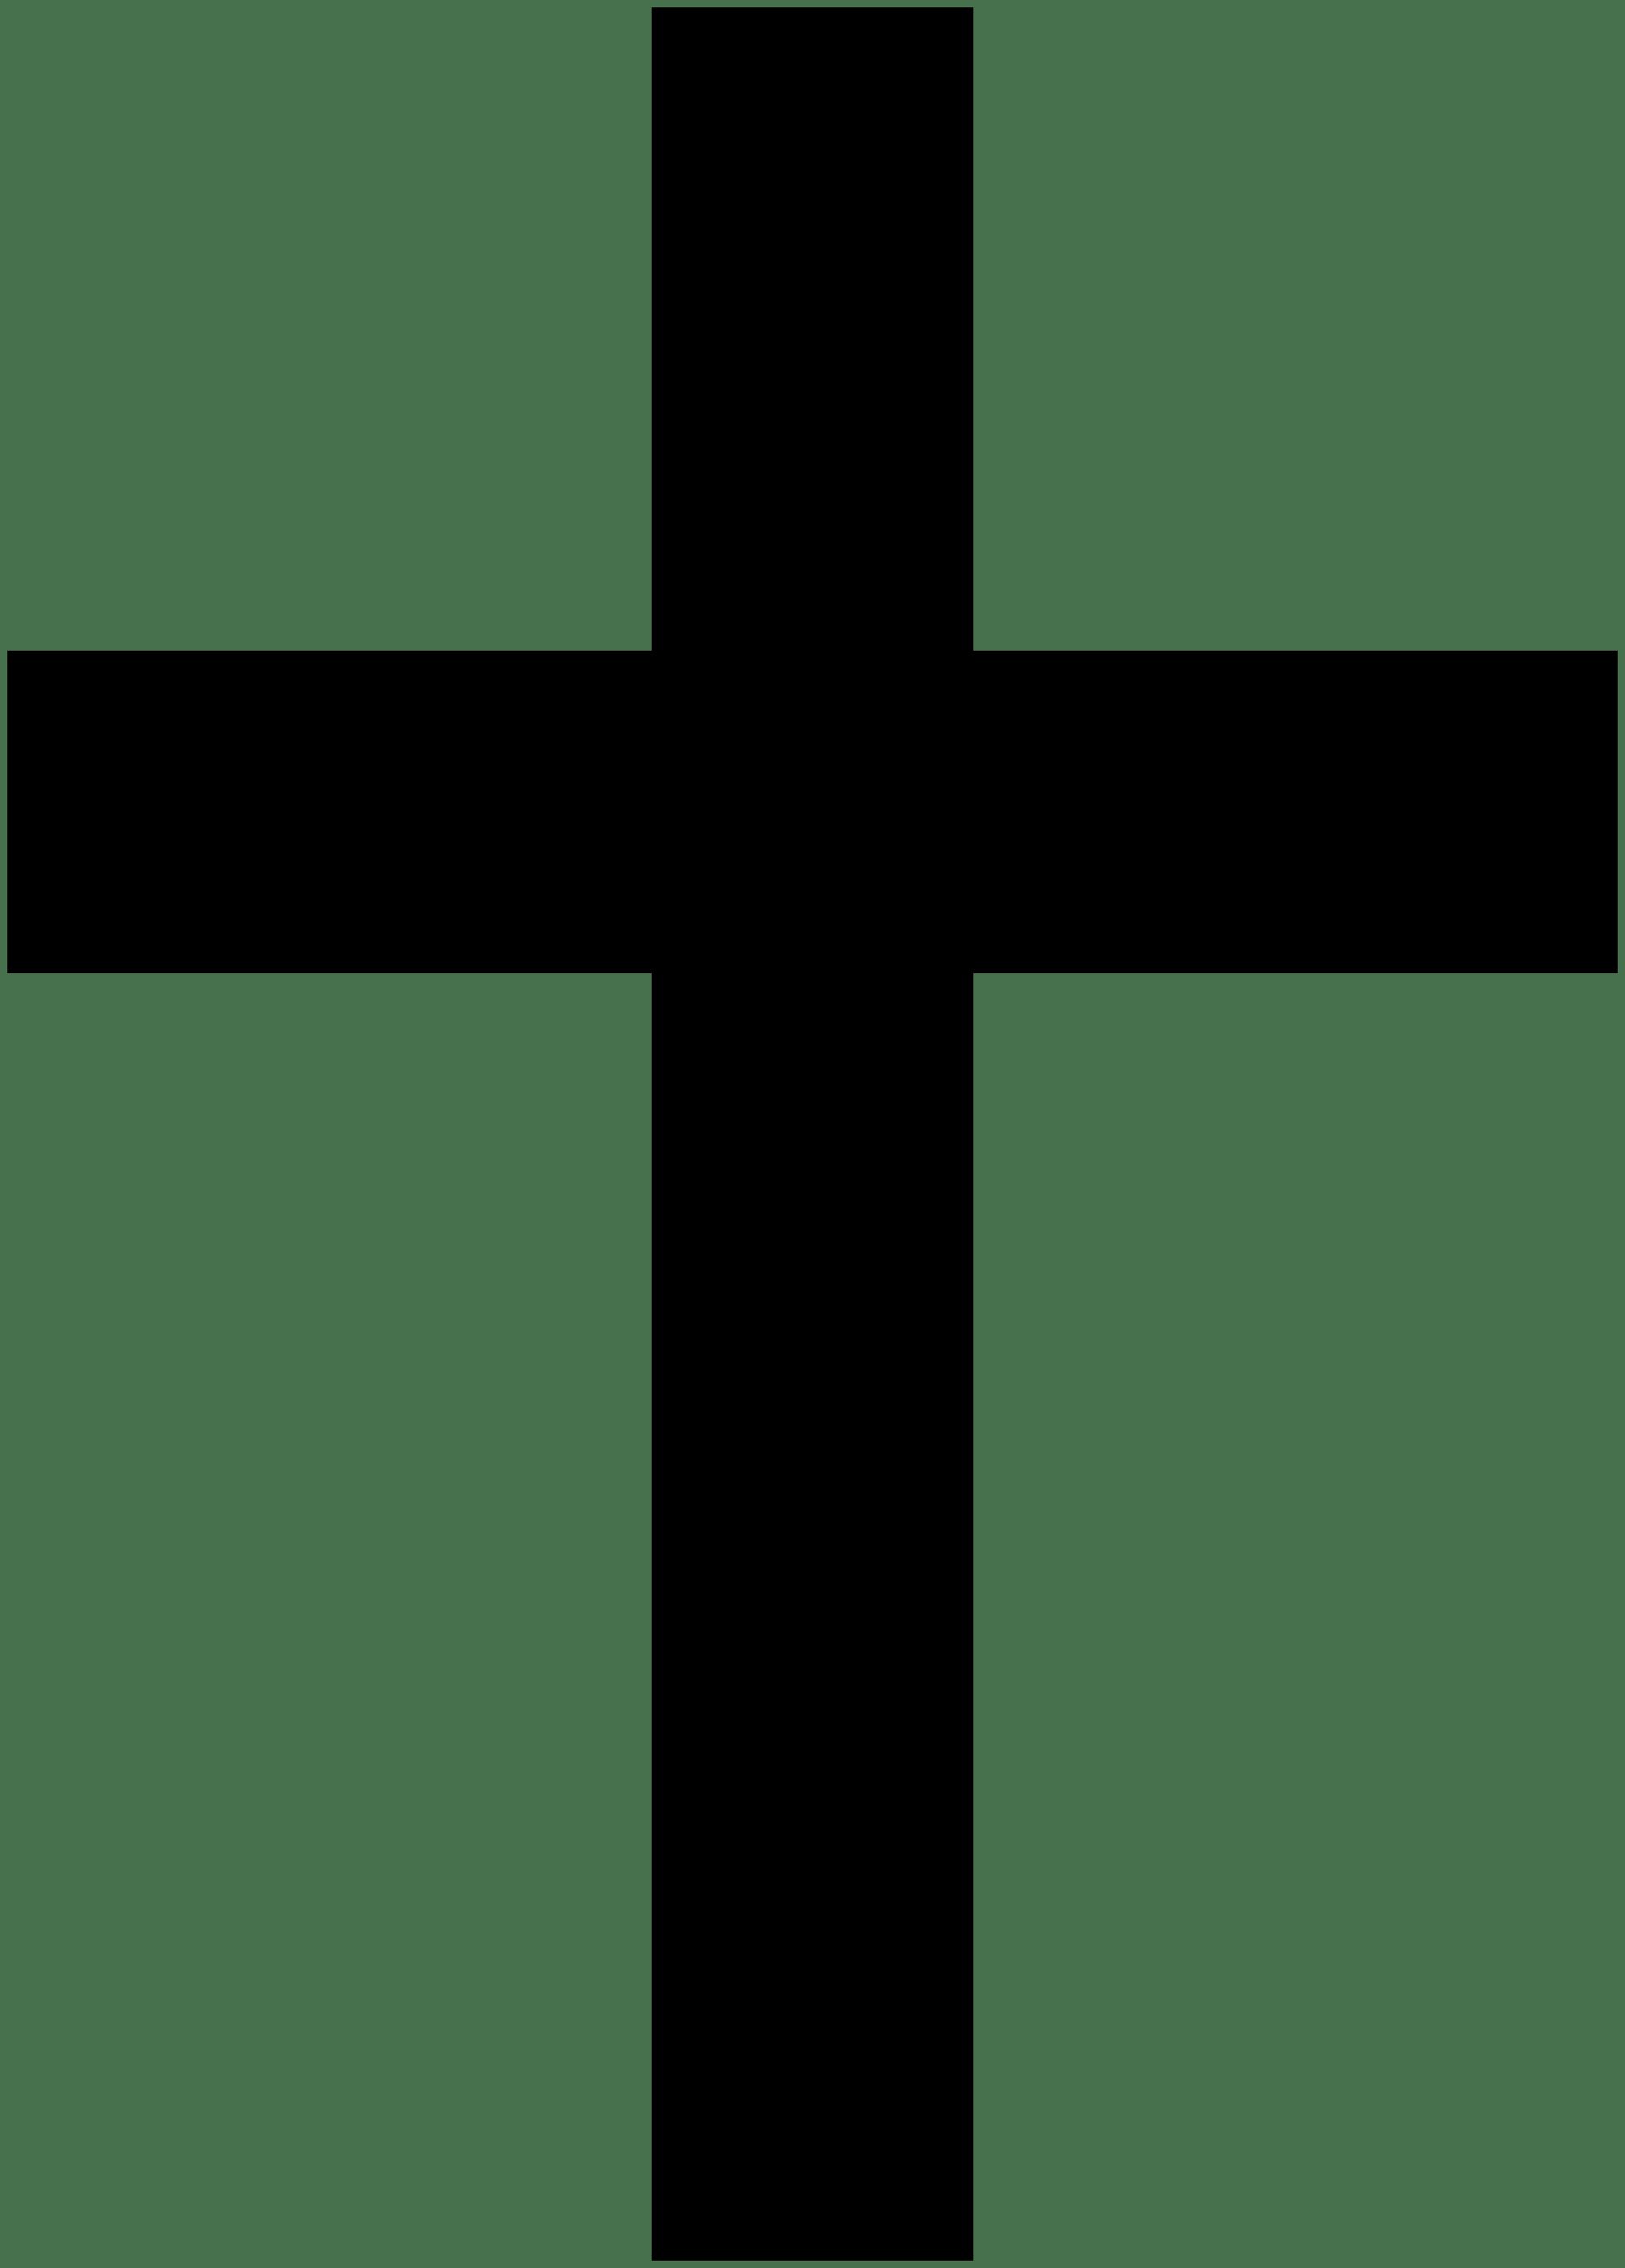 Simple Christian Cross Clipart - Christian PNG HD Crosses